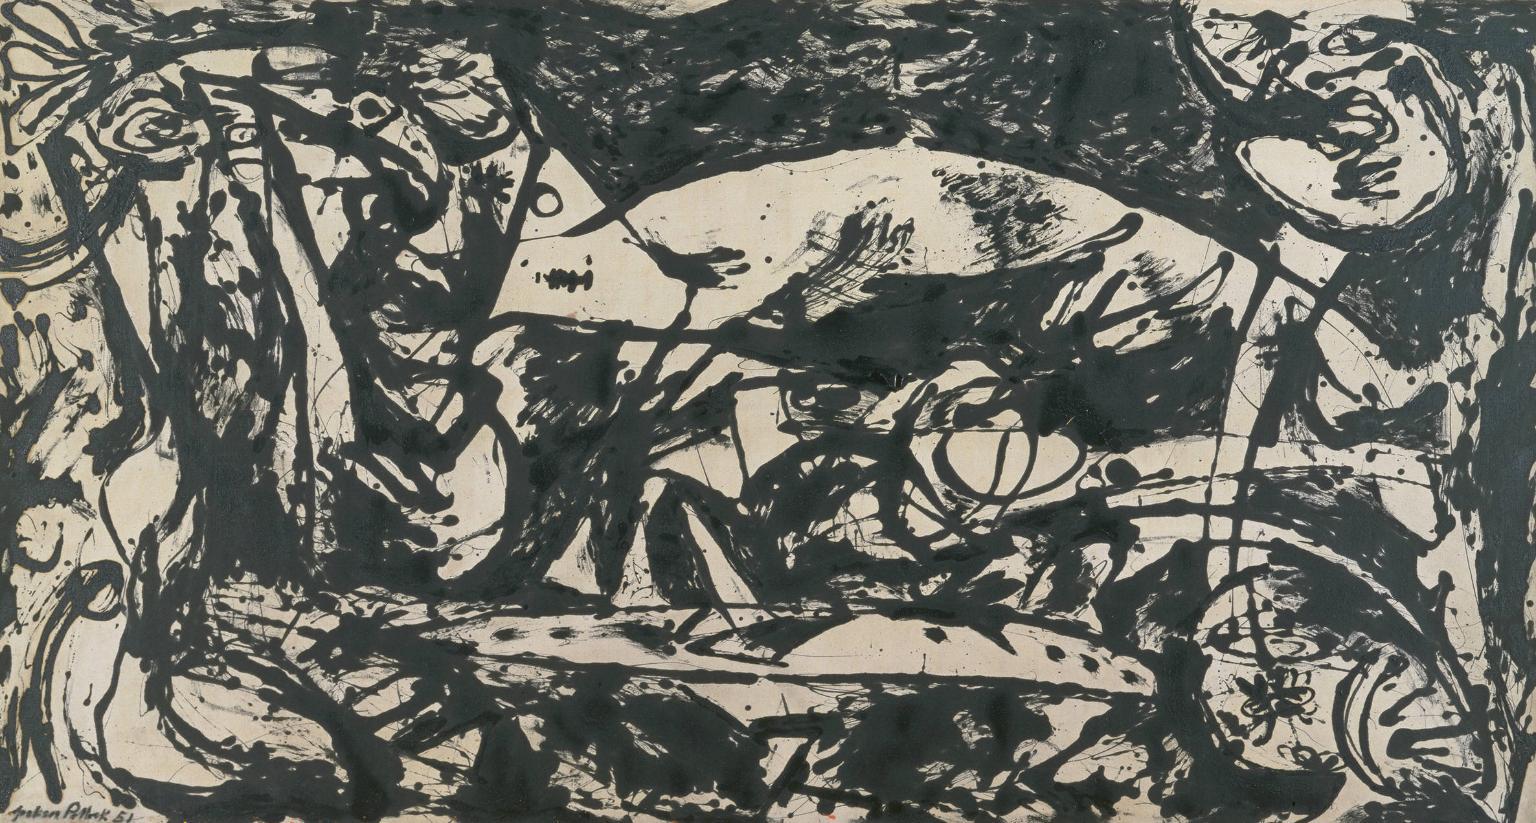 Jackson Pollock, Number 14, 1951, oil paint on canvas (© The Pollock-Krasner Fou